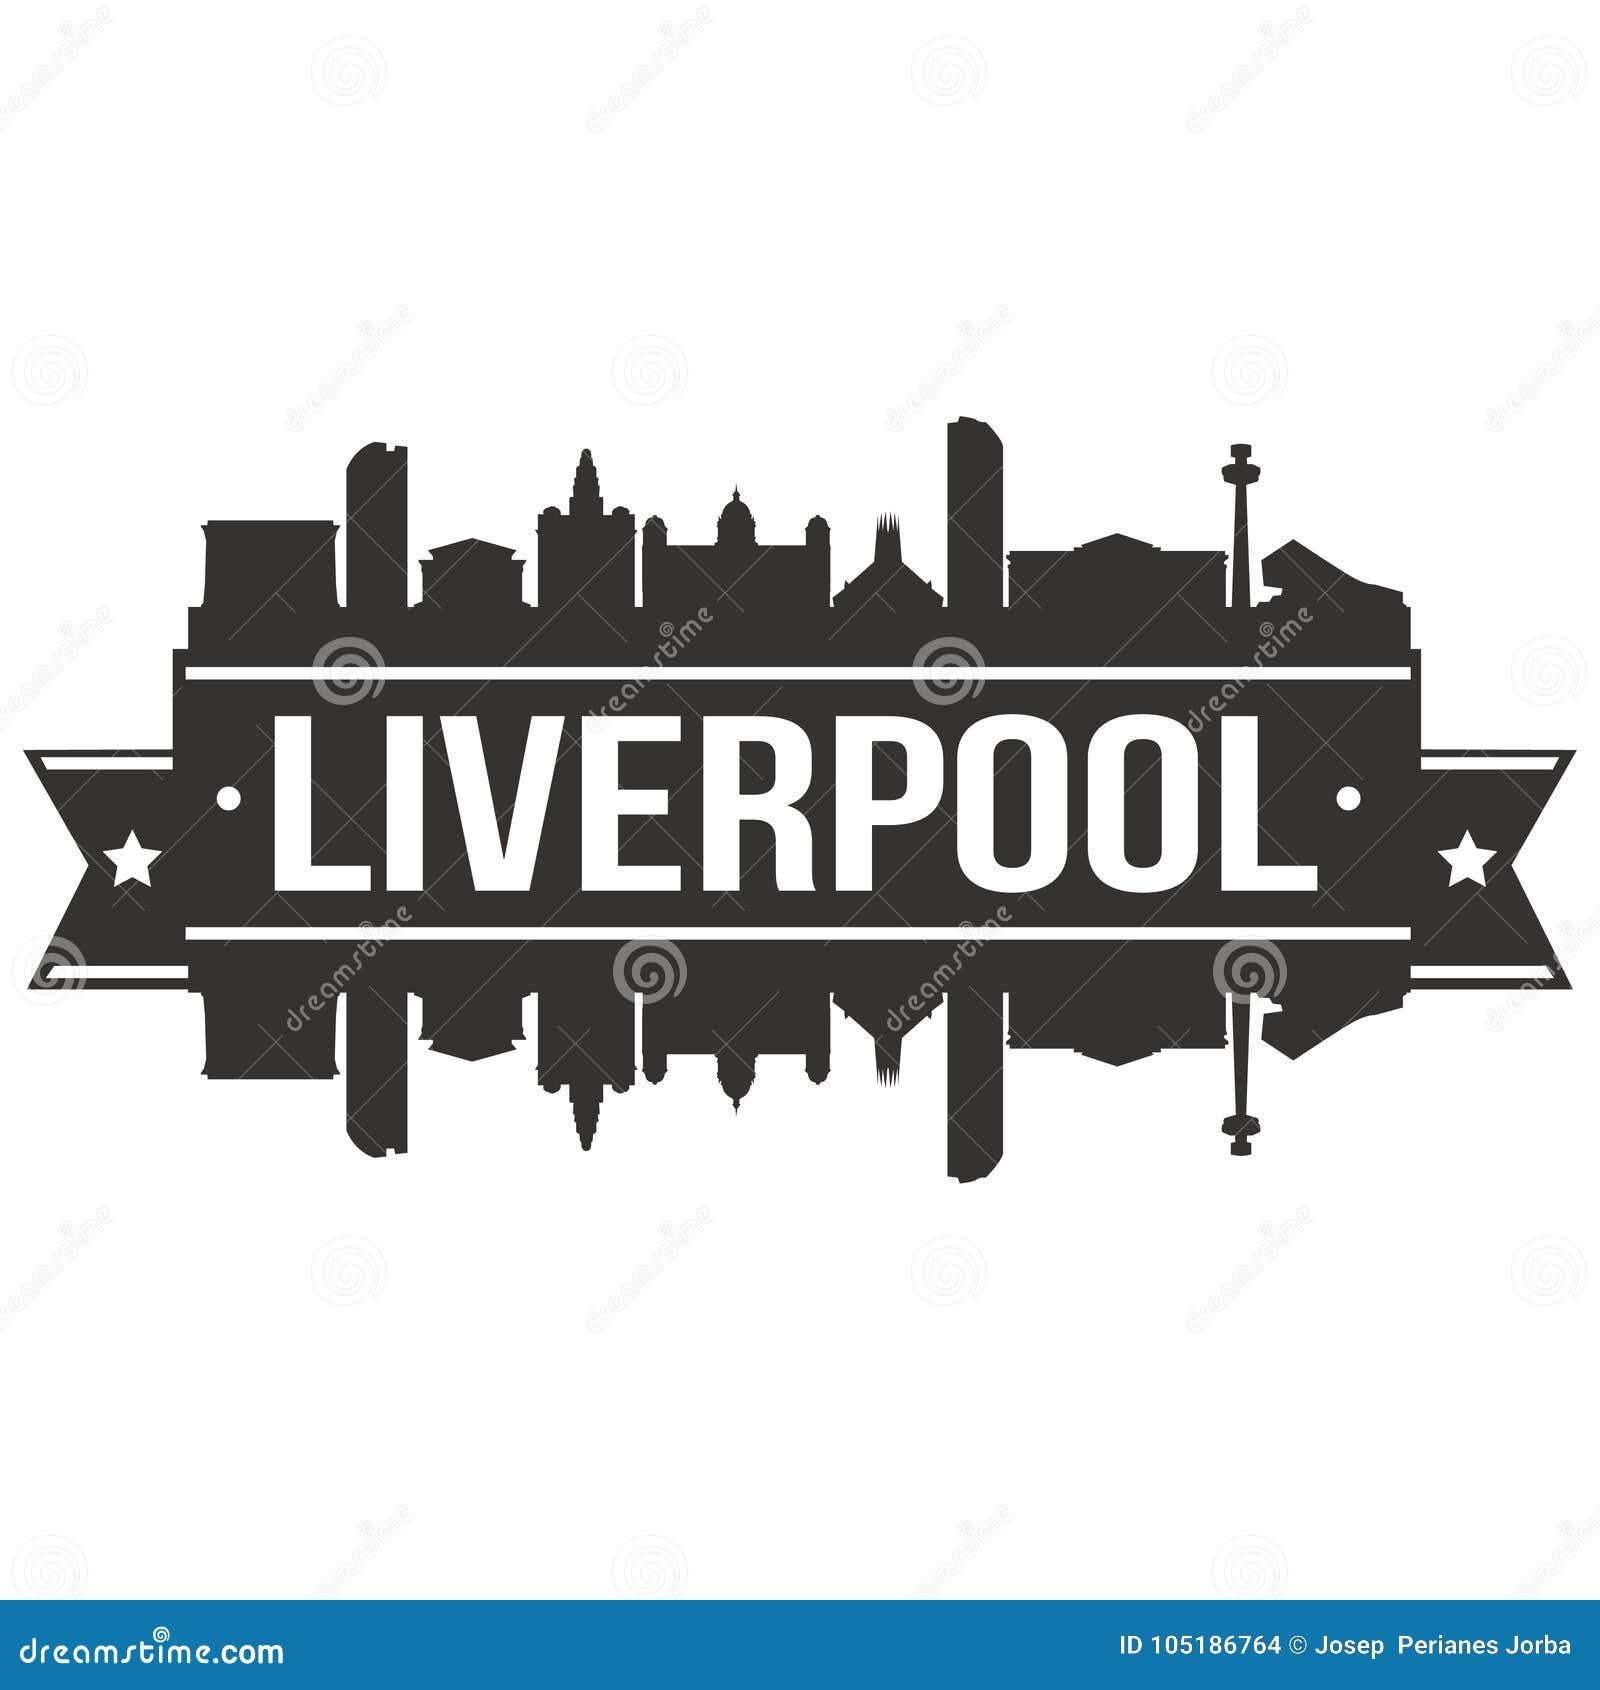 Liverpool United Kingdom Euro Europe Icon Vector Art Design Skyline Flat City Silhouette Editable Template Stock Vector Illustration Of Label Banner 105186764